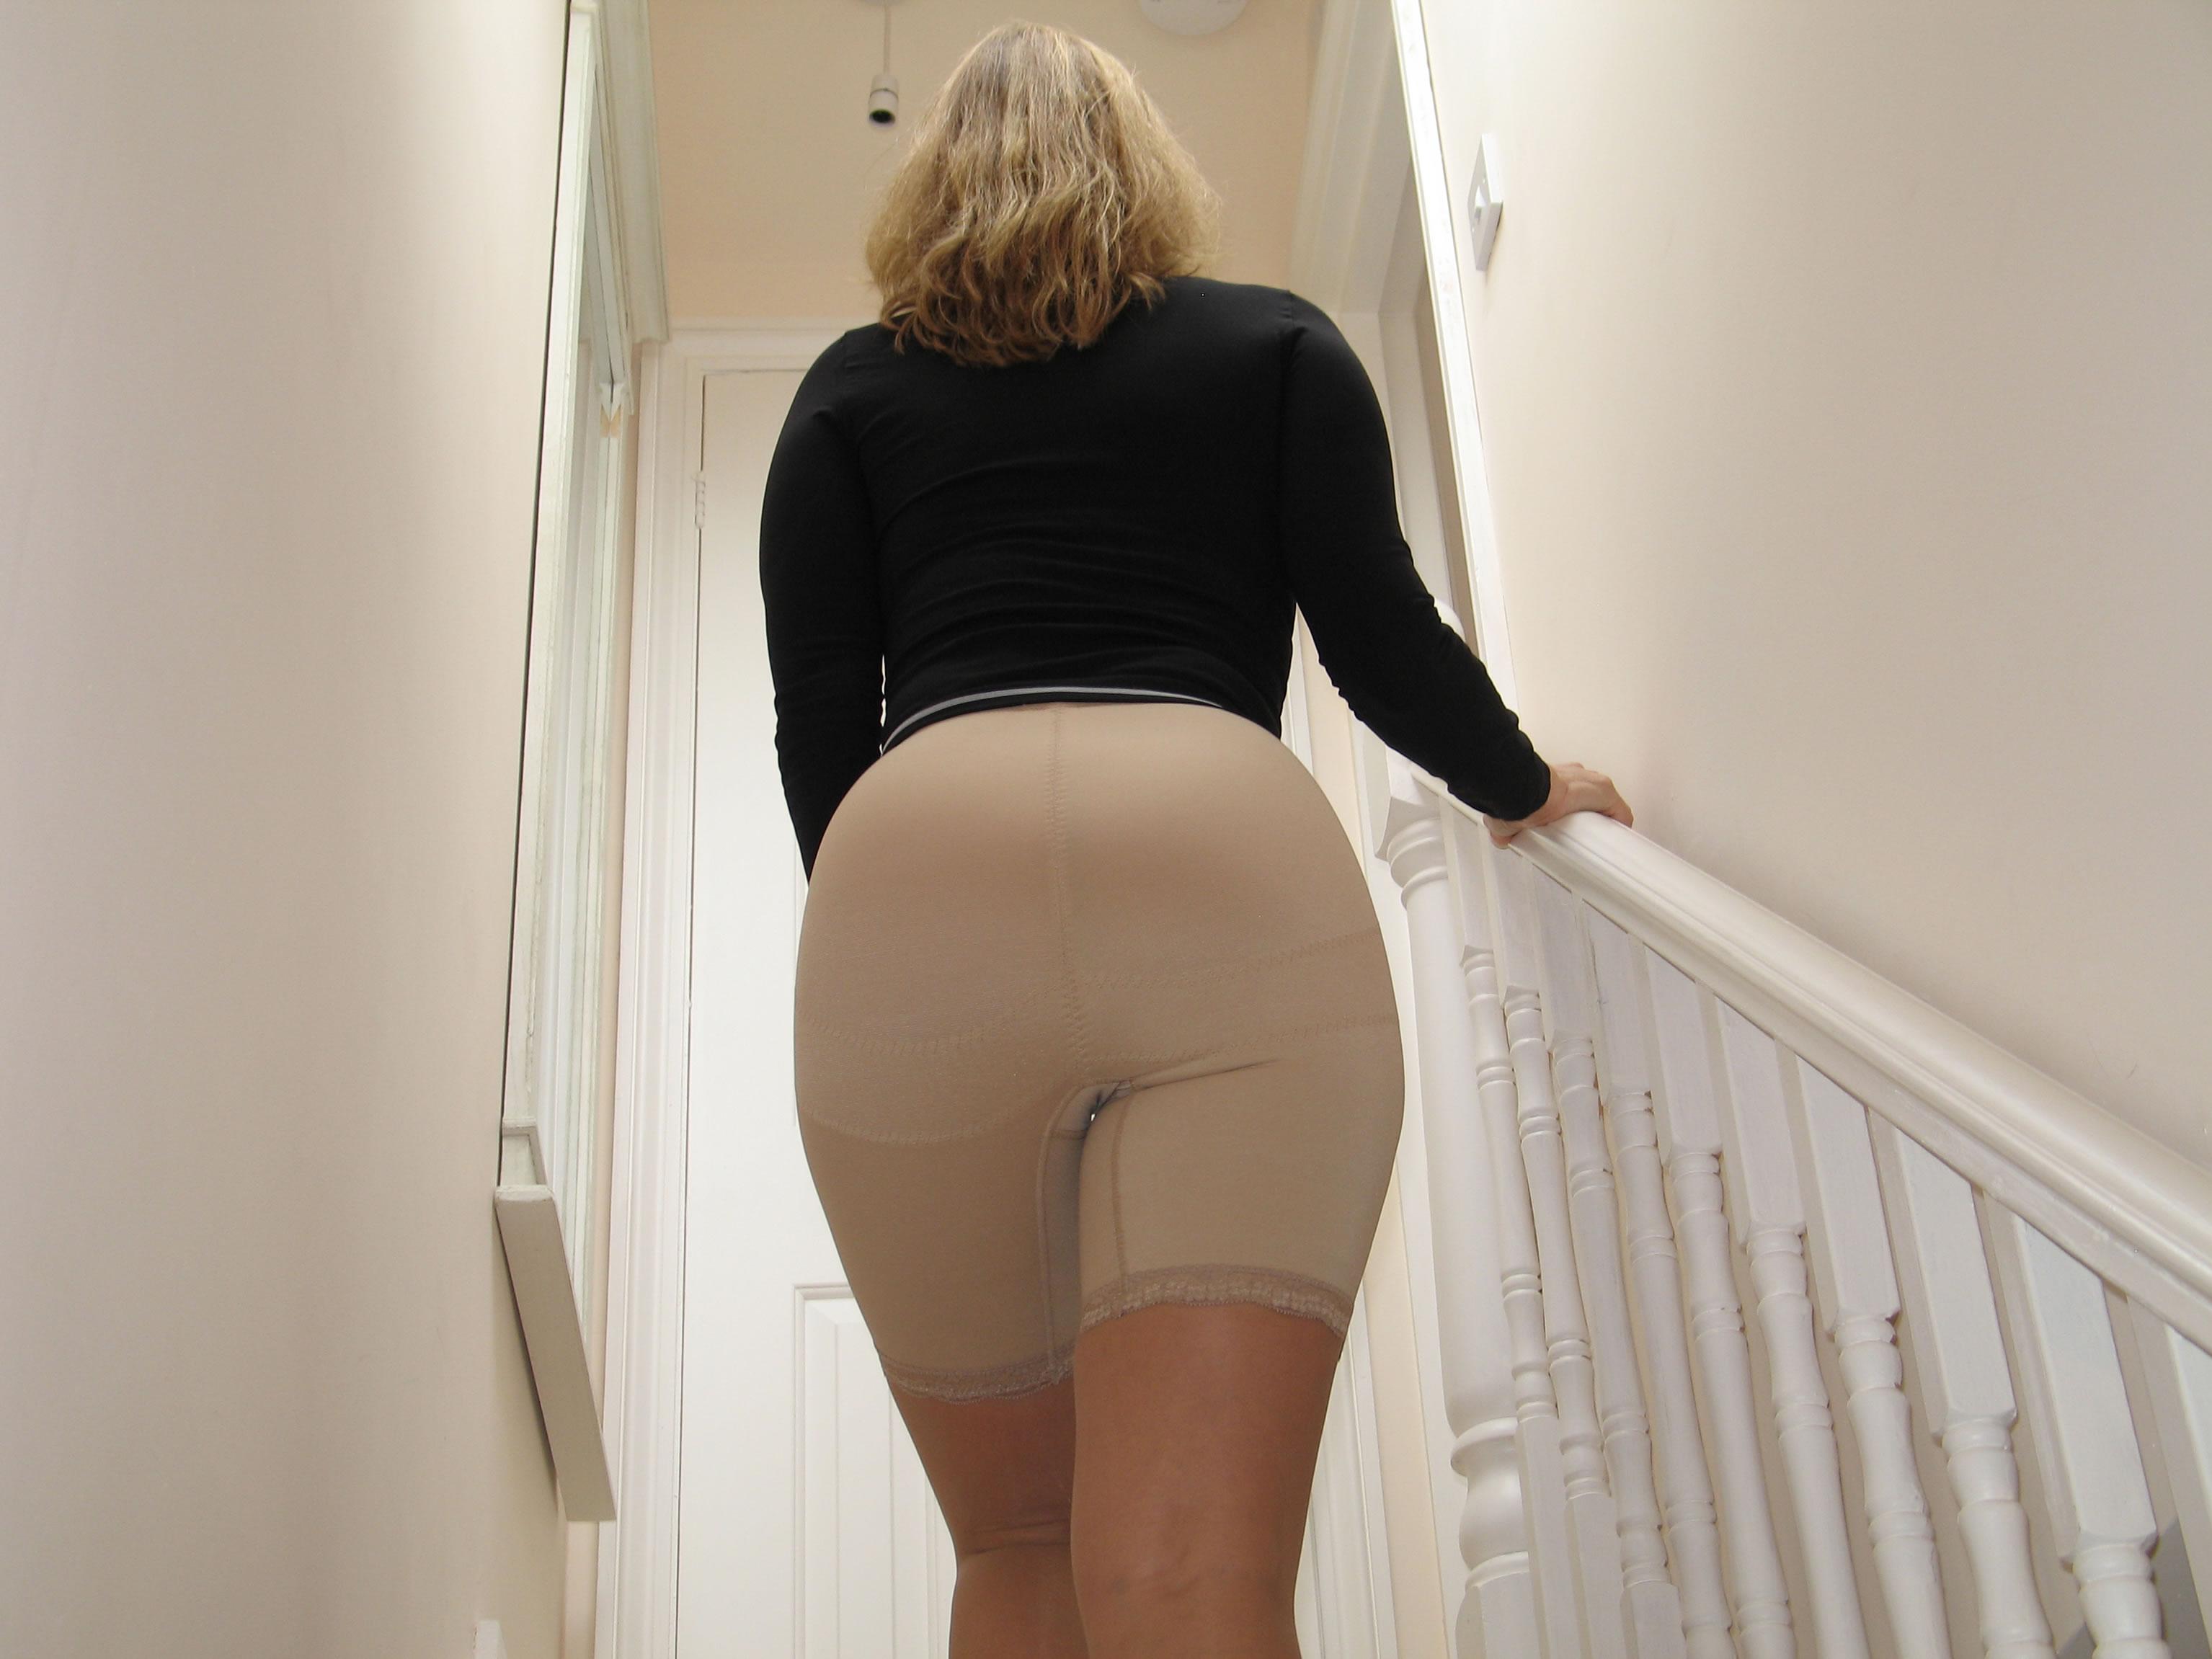 Фото эротика девушки в панталонах 3 фотография